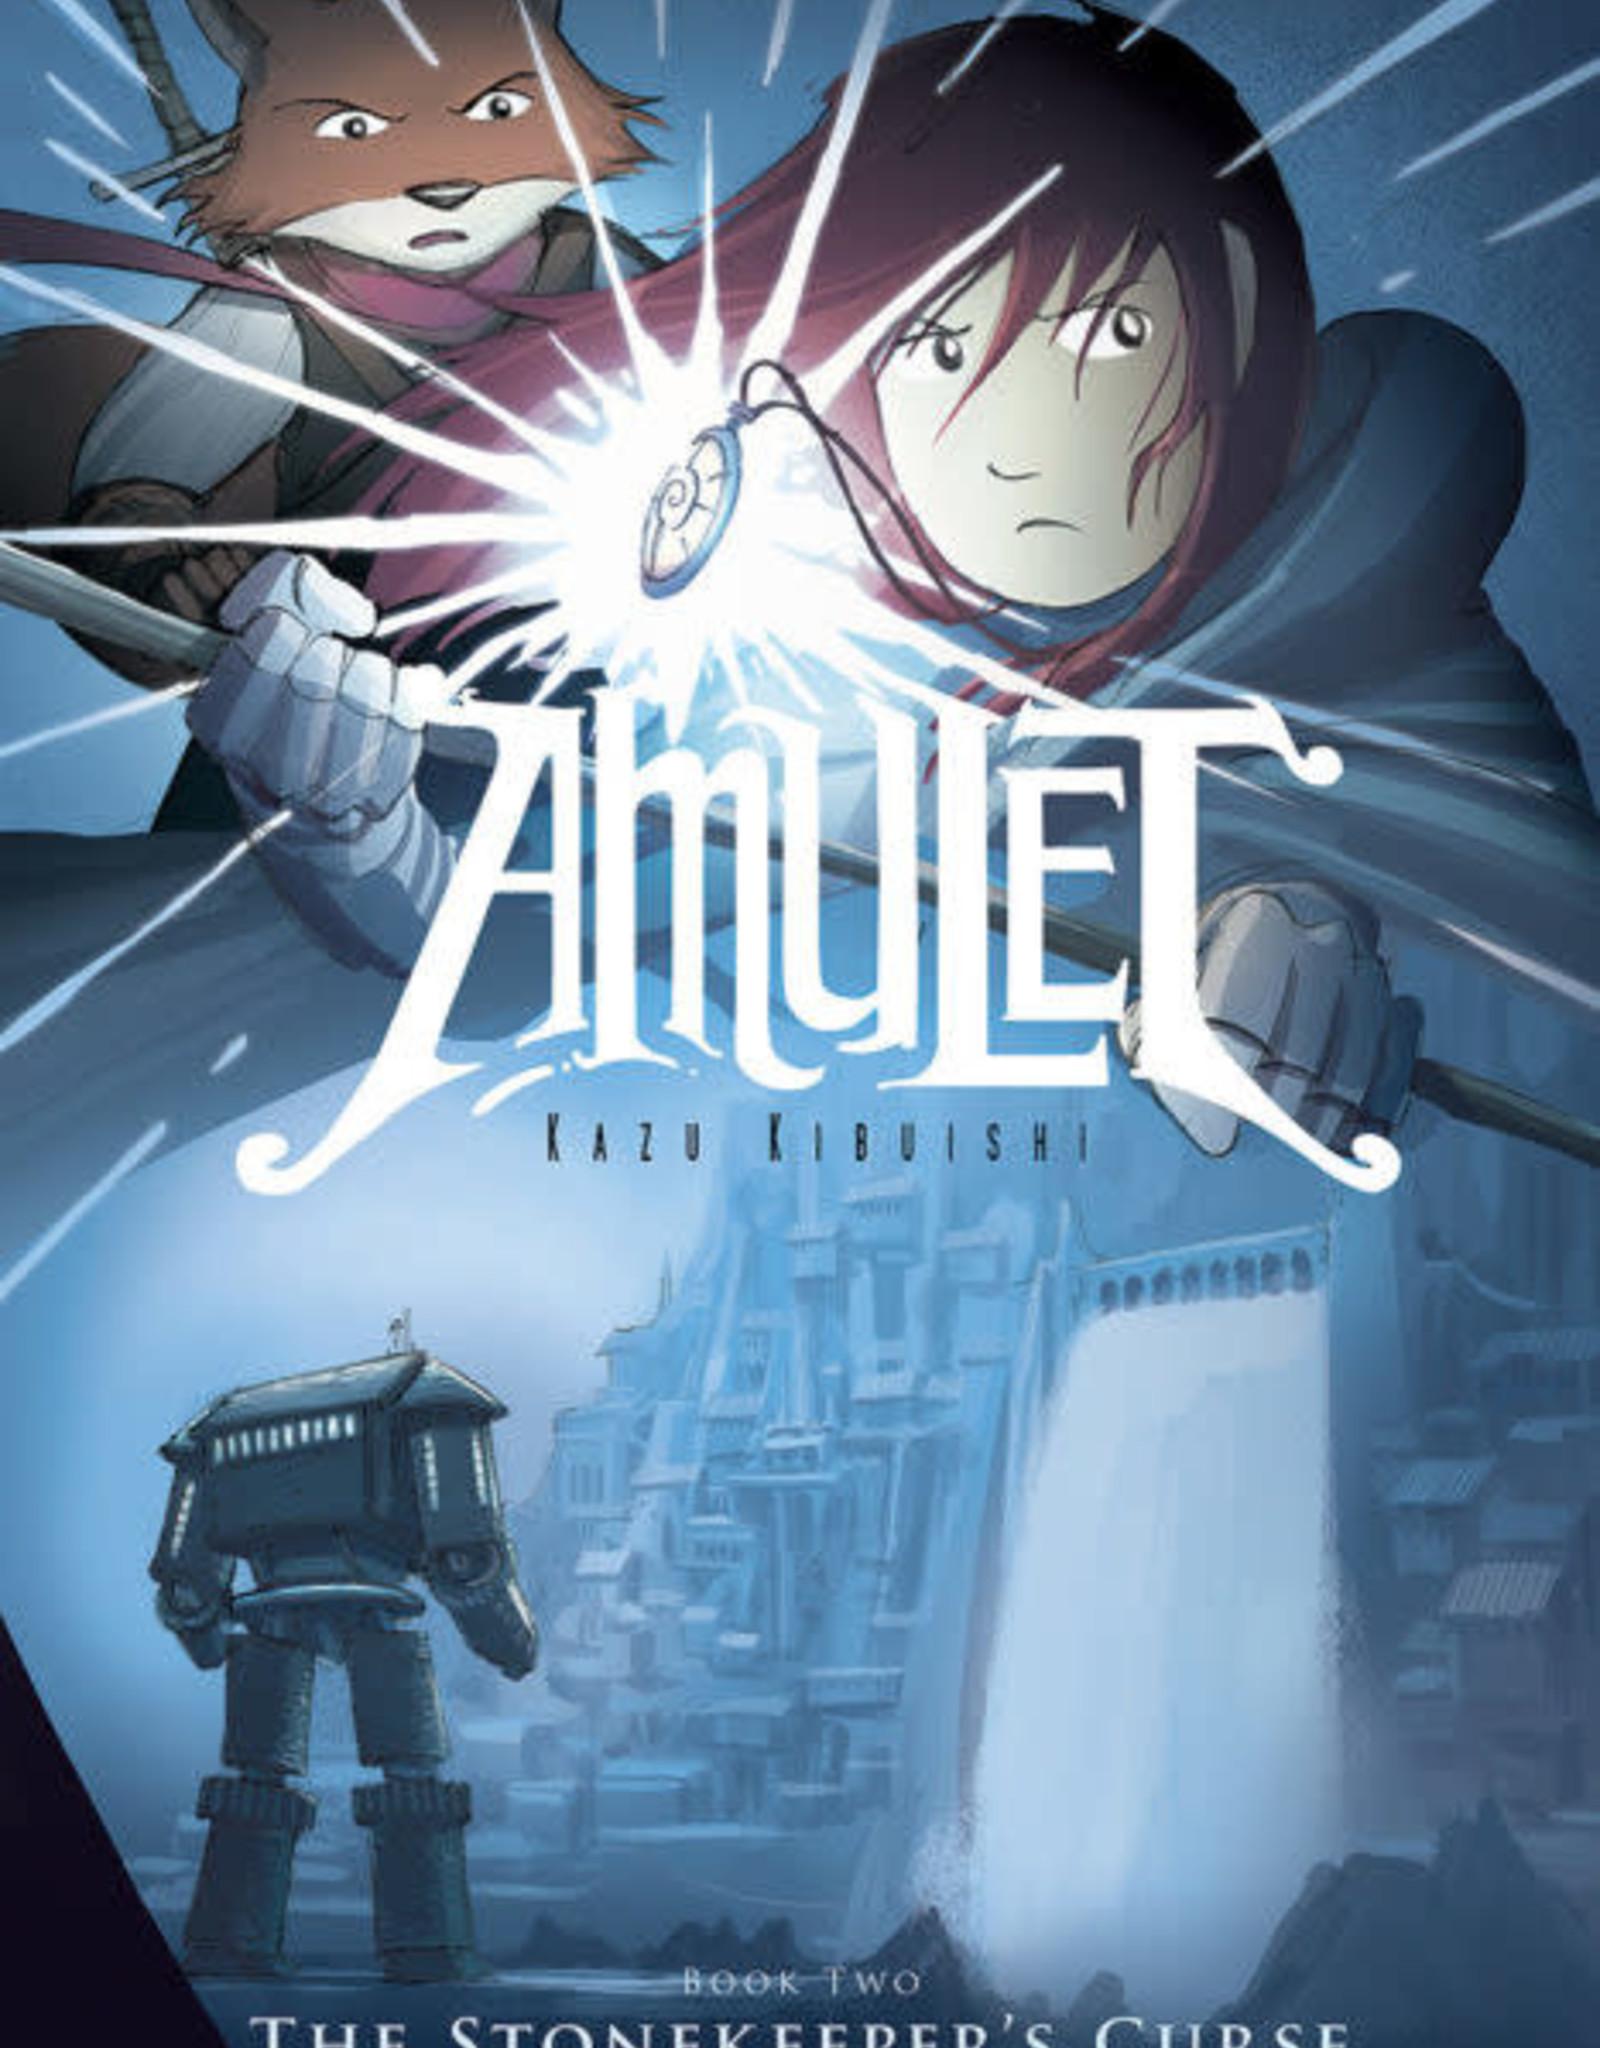 Graphix Amulet v02 The Stonekeeper's Curse